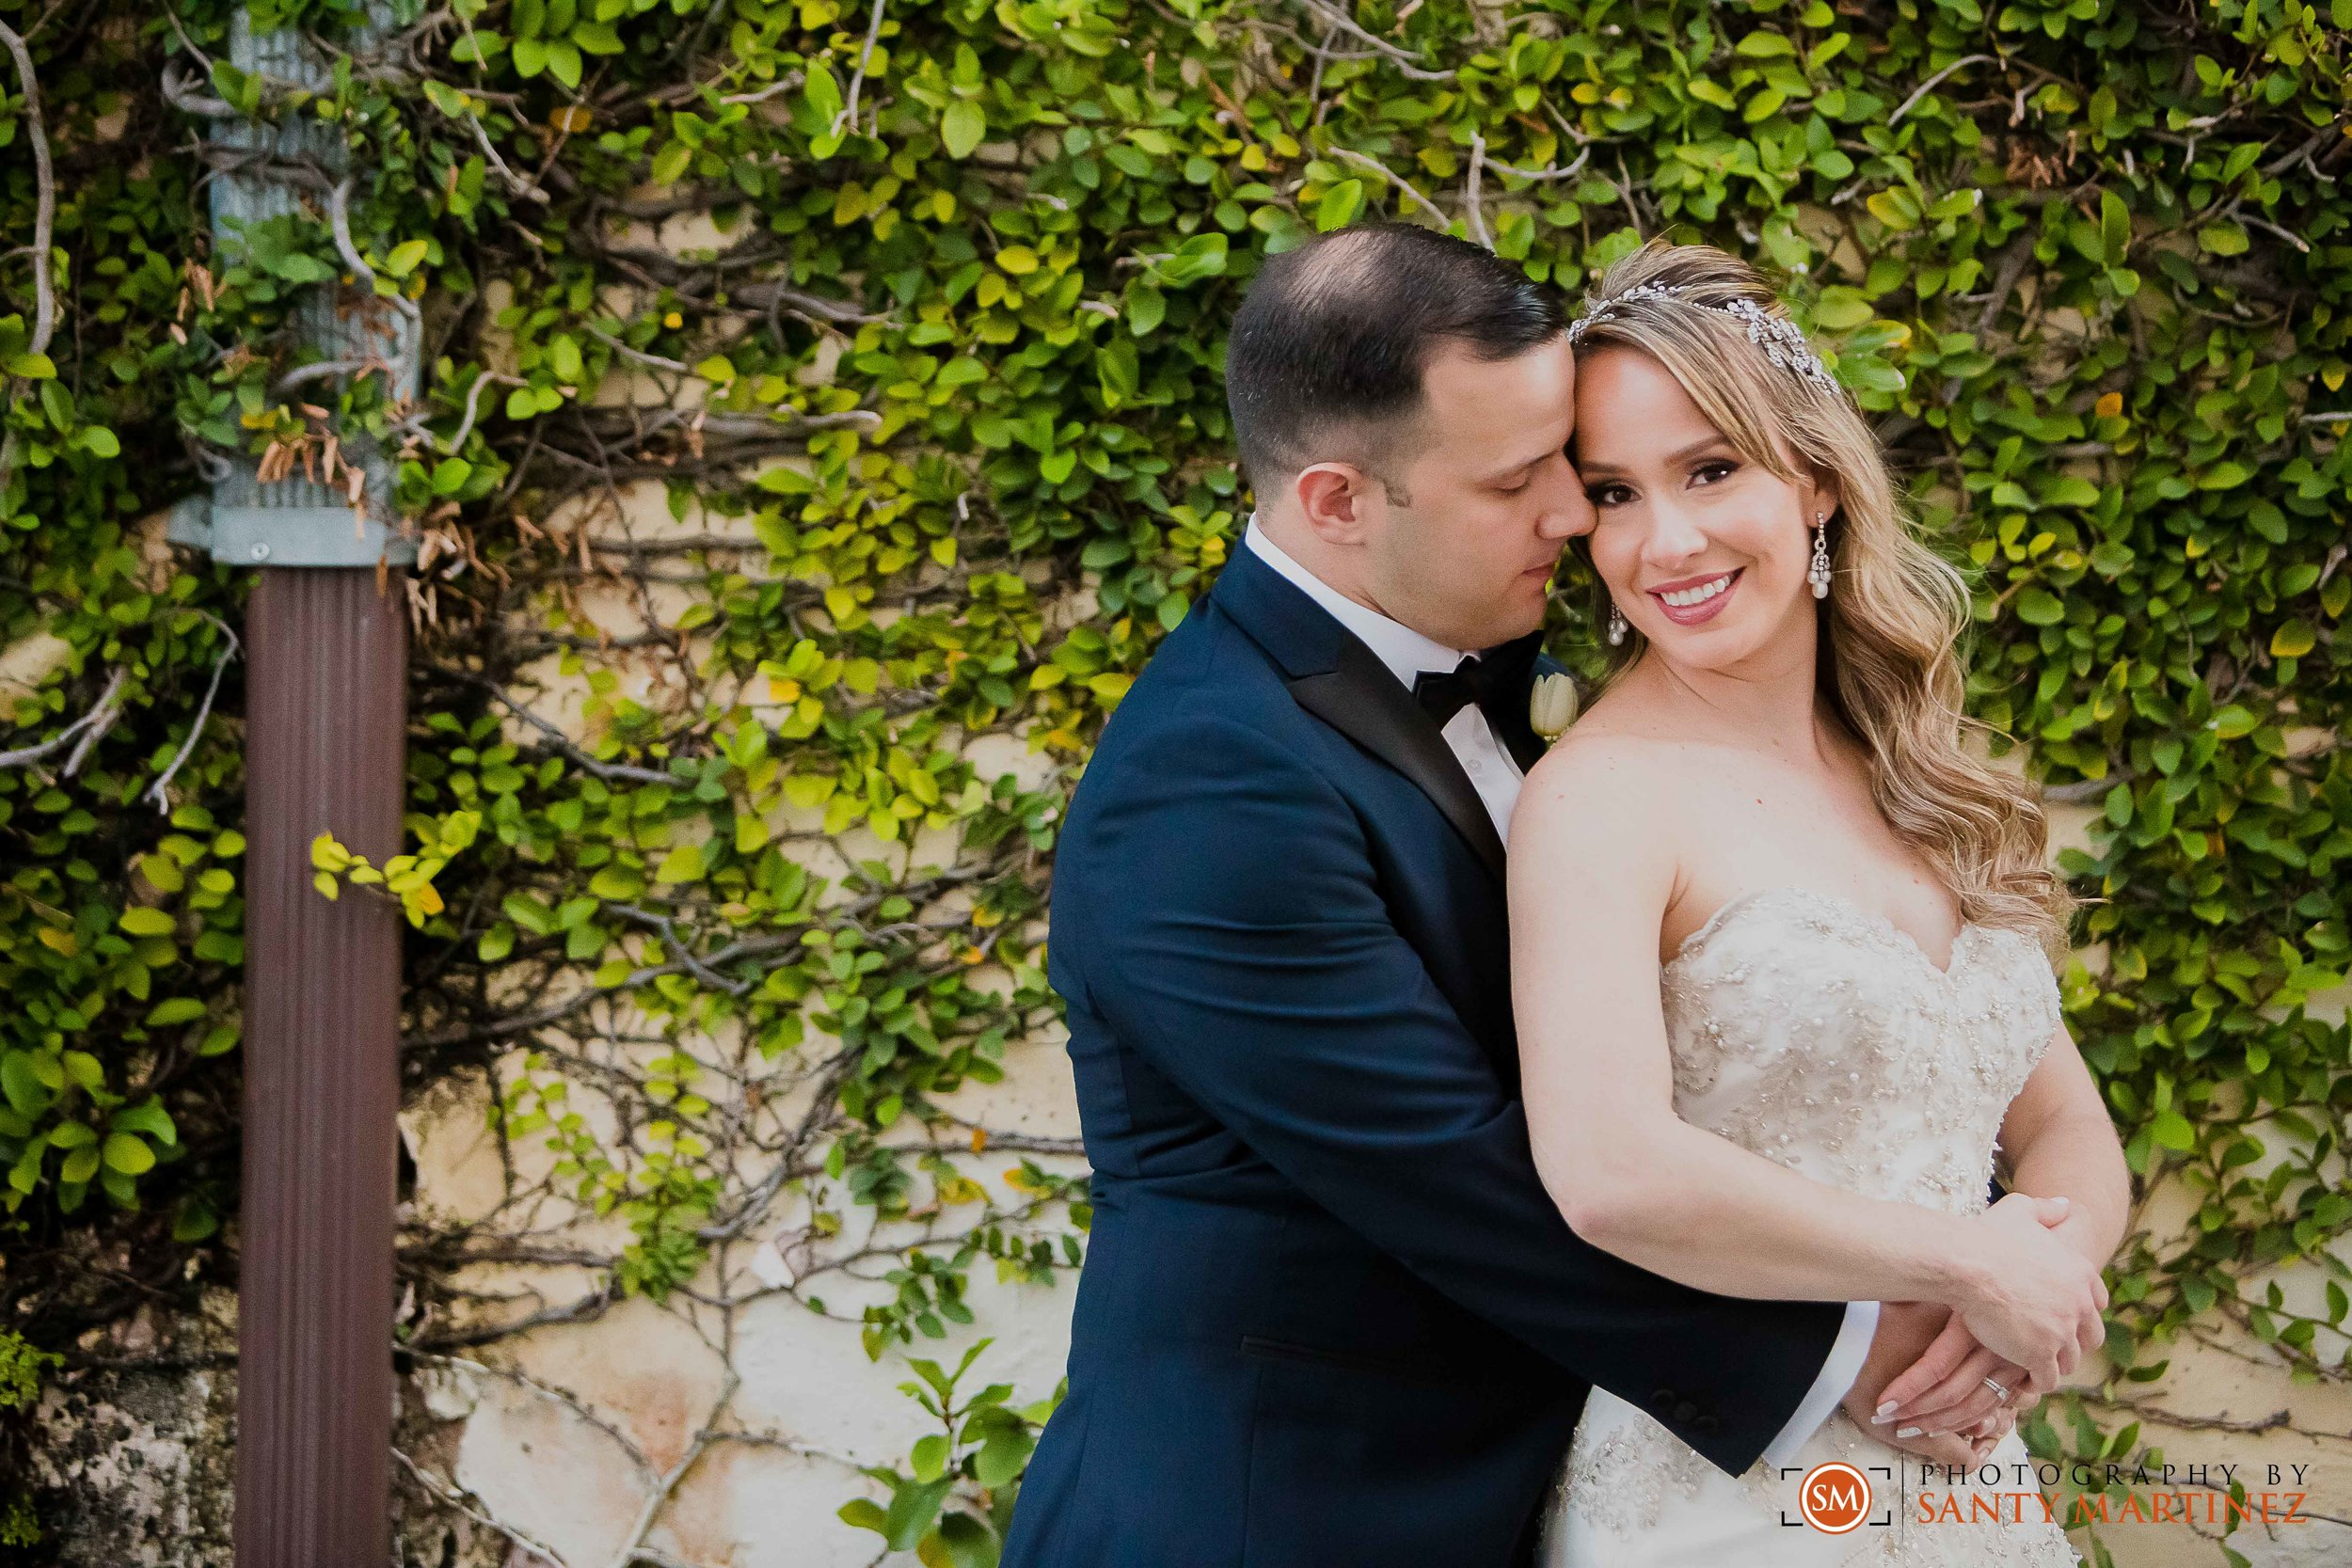 Wedding La Jolla Ballroom - Photography by Santy Martinez-41.jpg